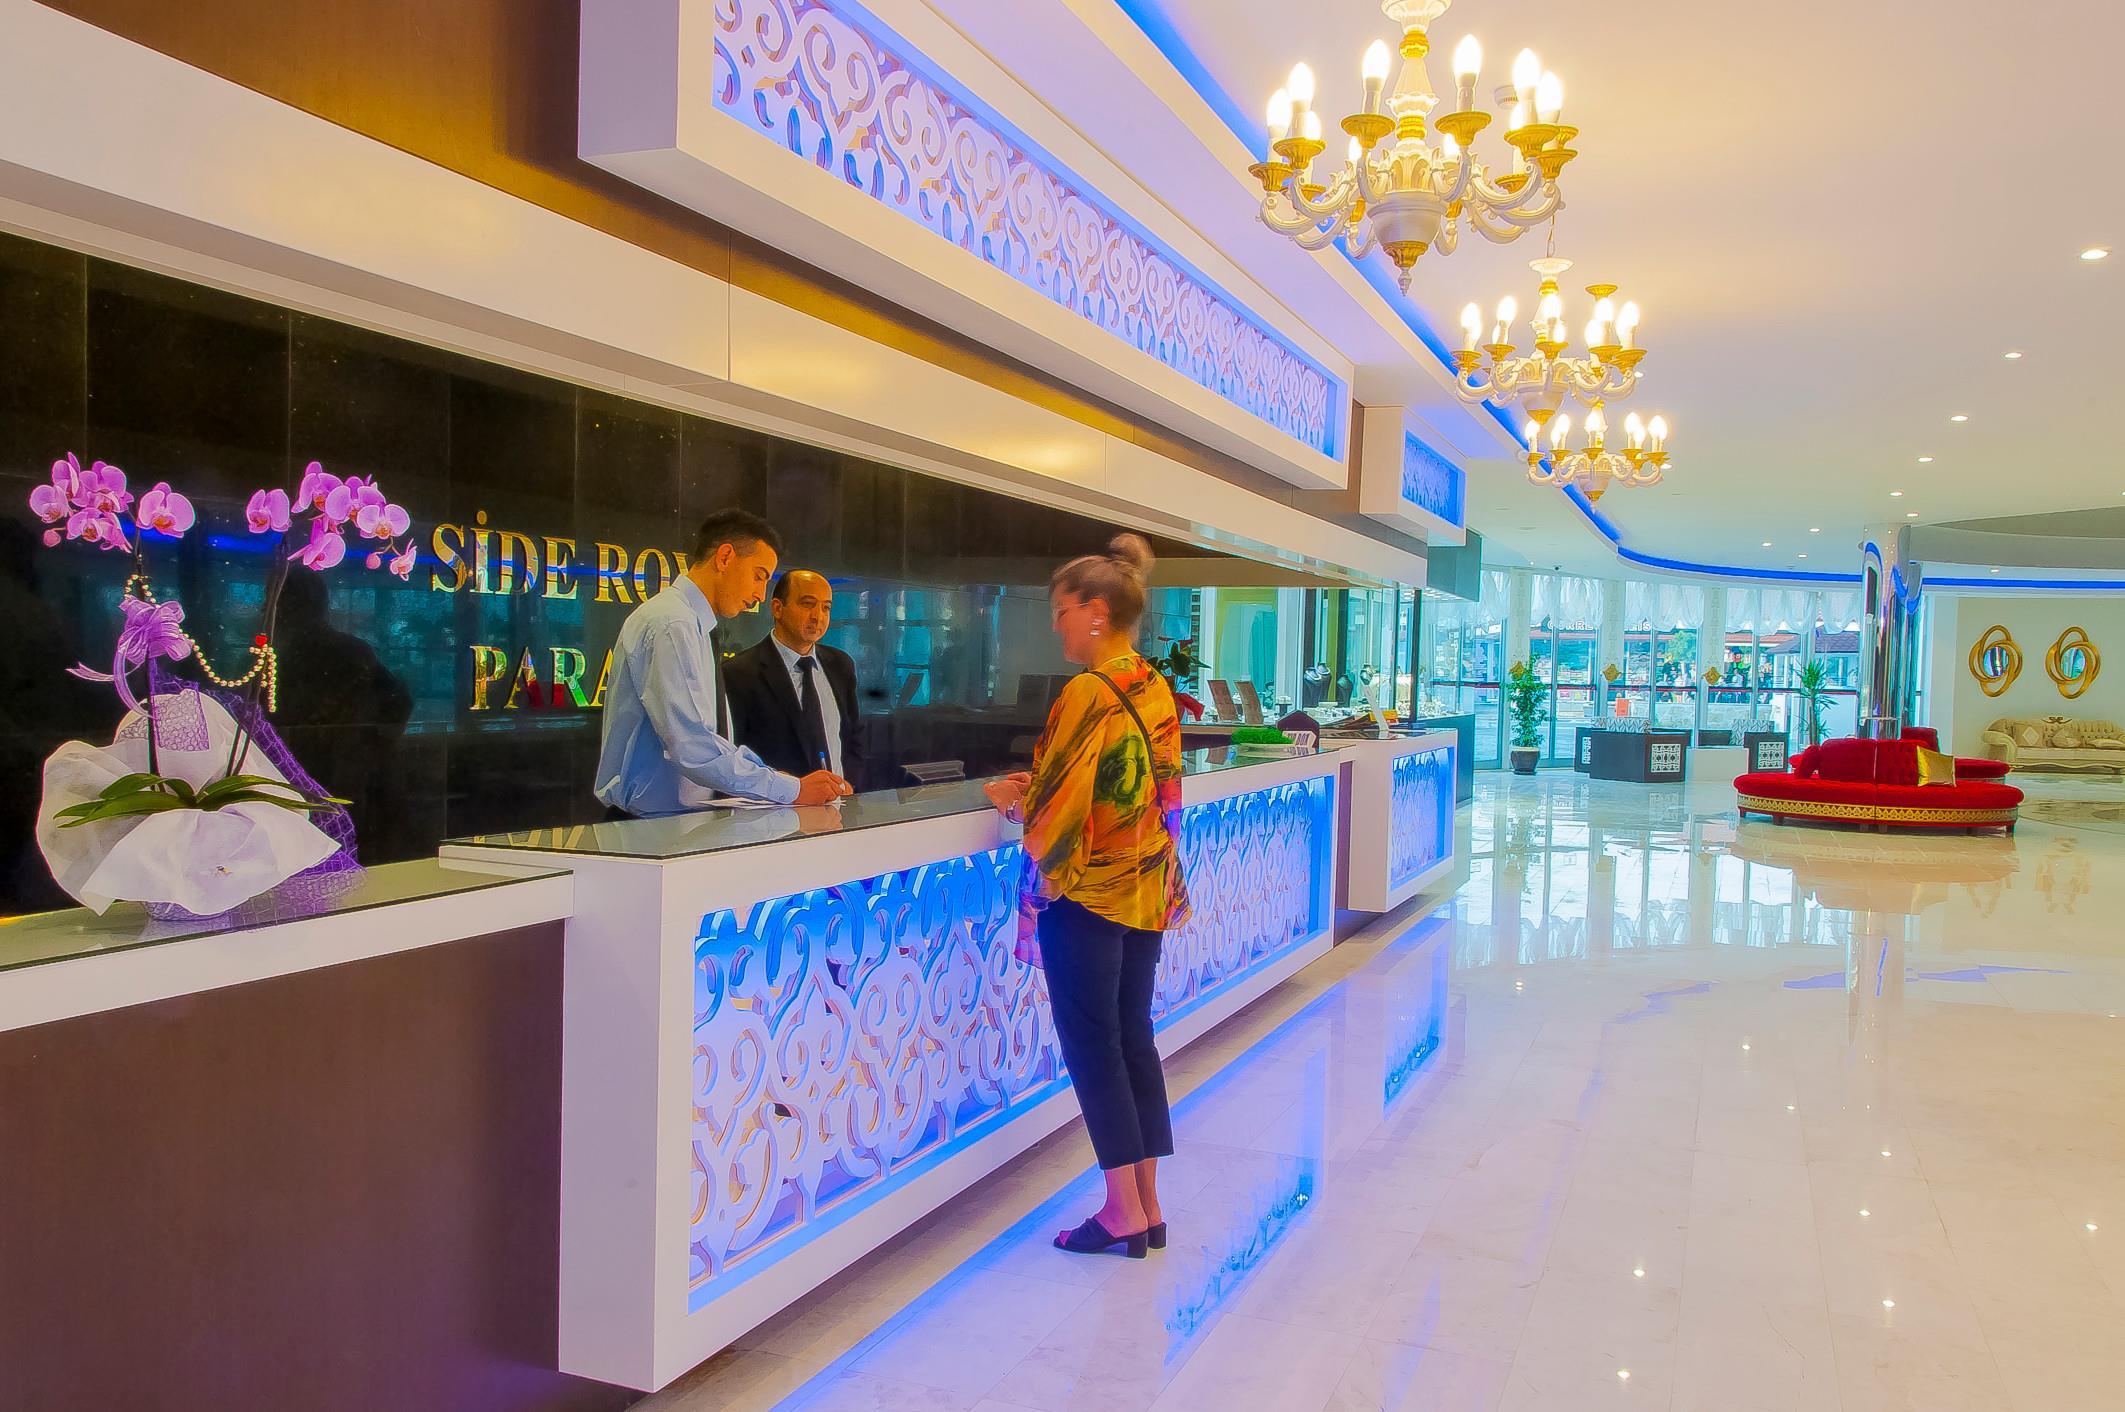 http://www.orextravel.sk/OREX/hotelphotos/side-royal-paradise-general-0024.jpg